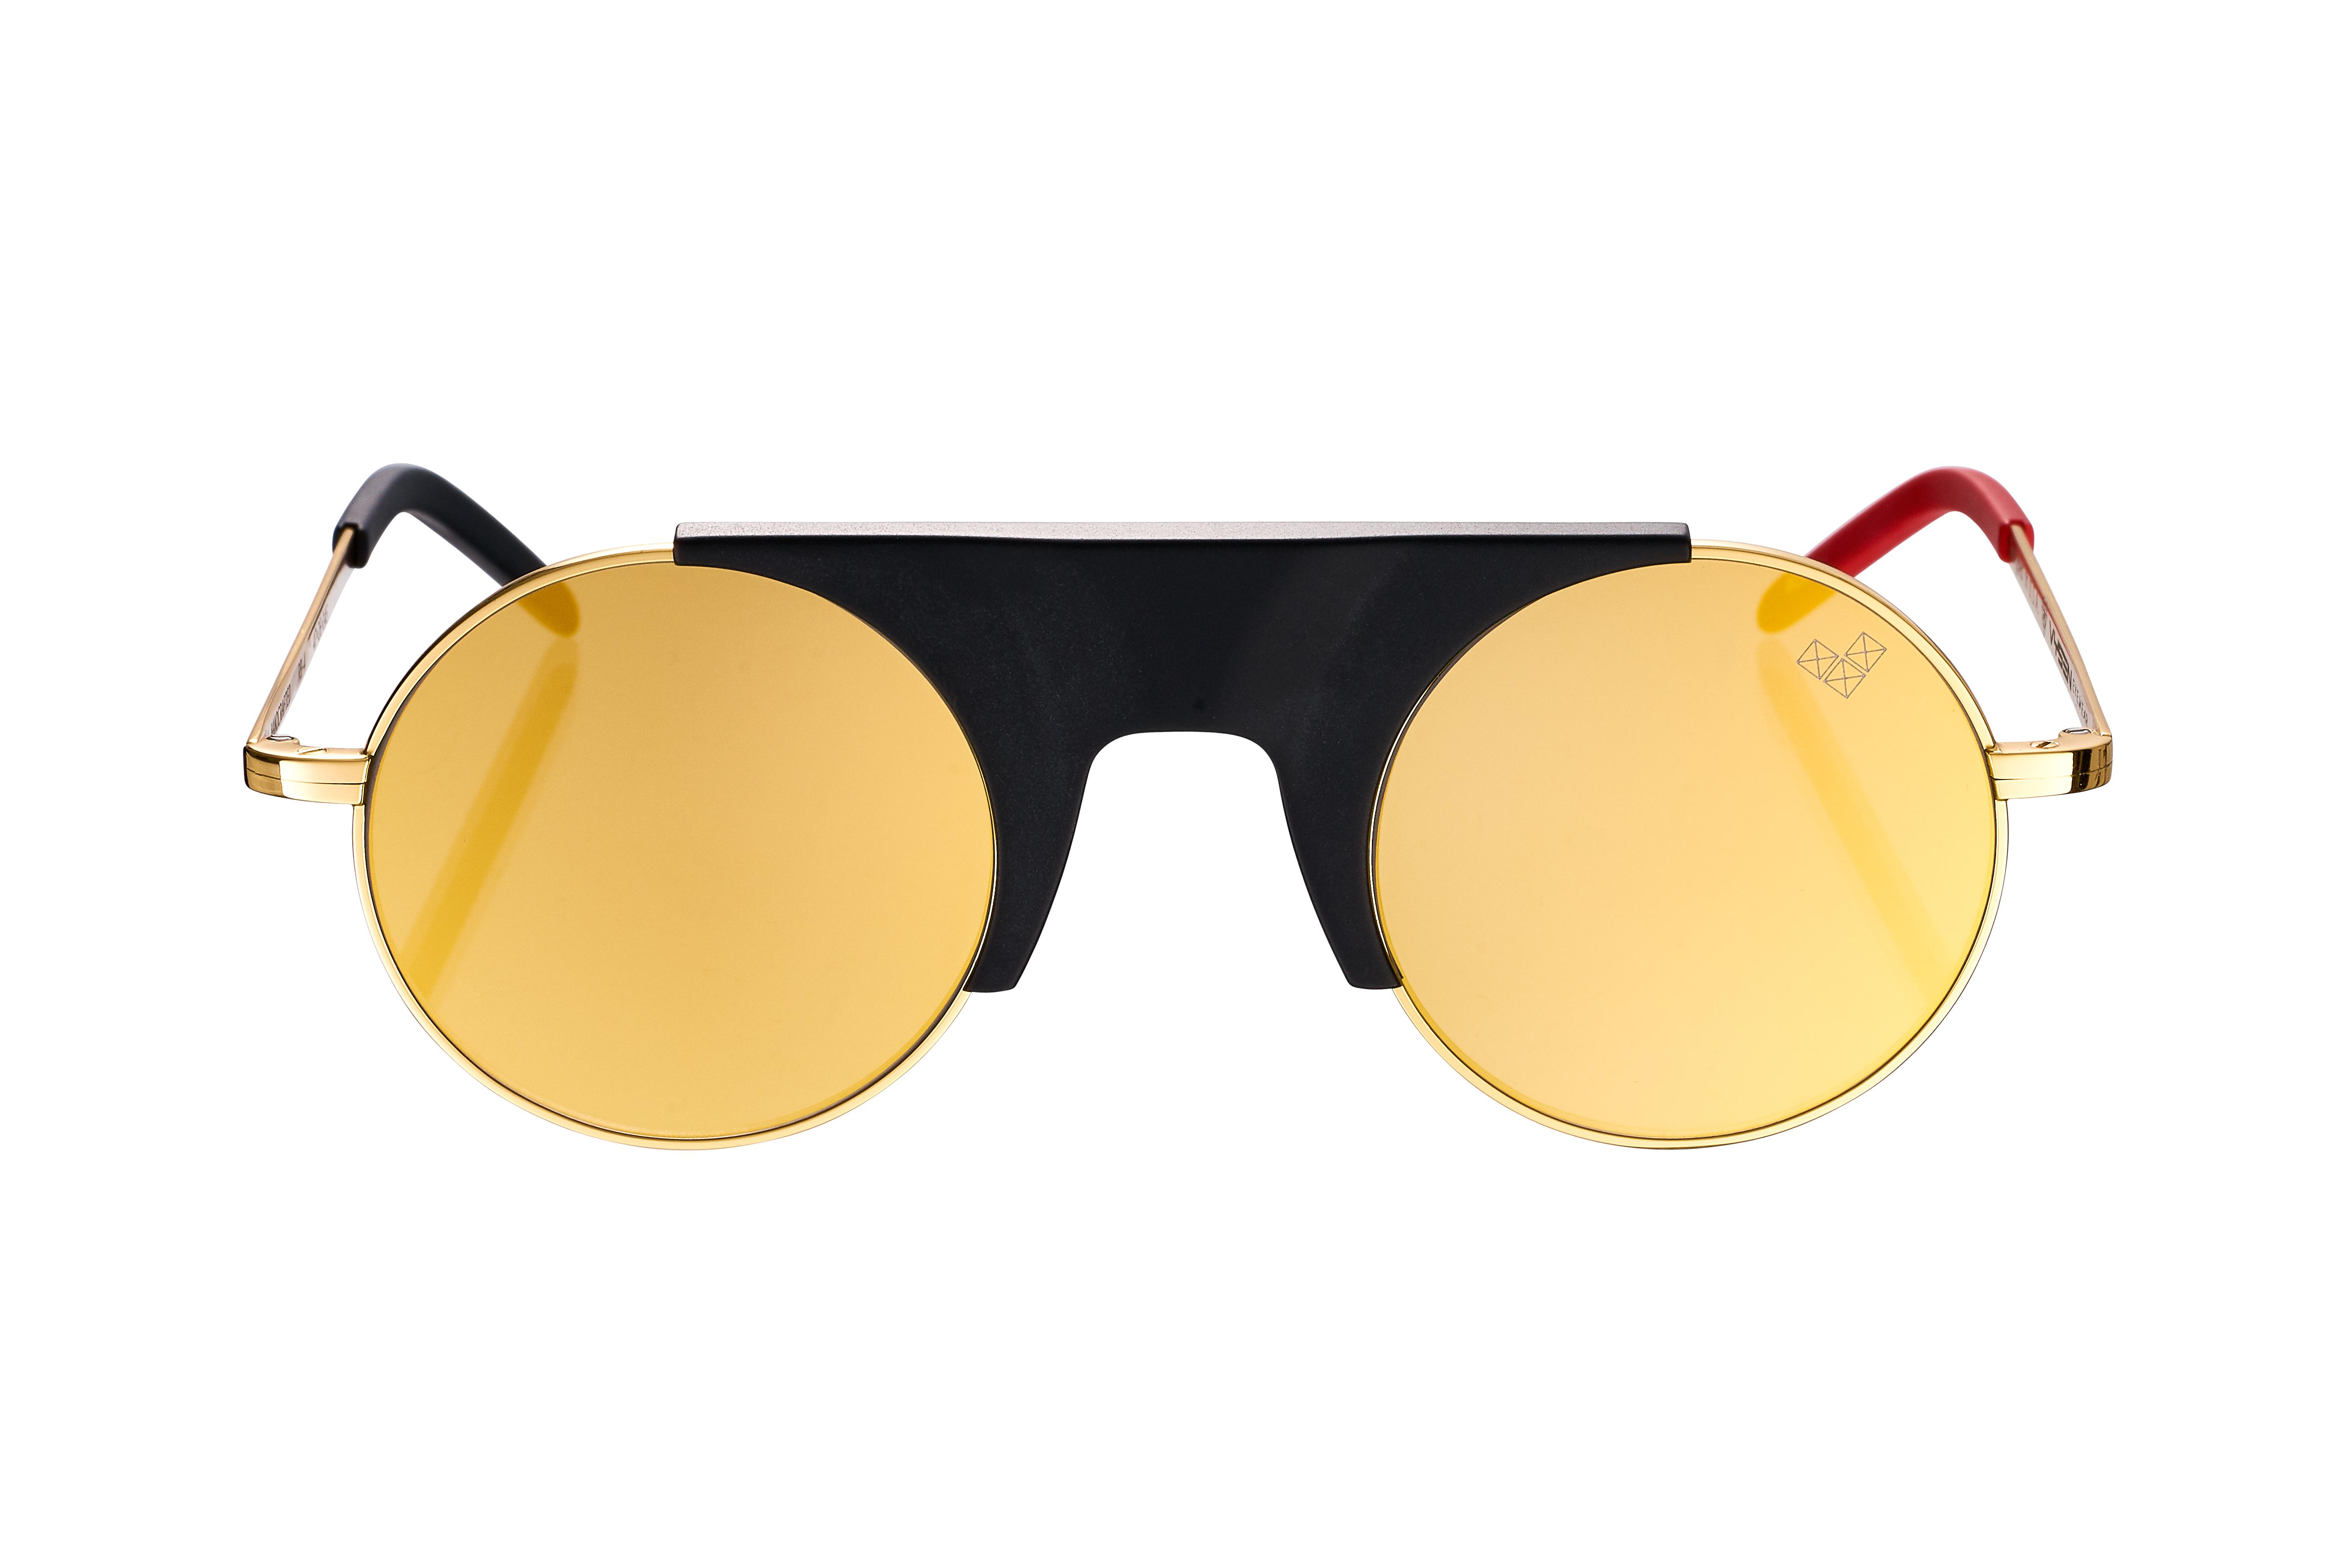 RUBI-Rb-4 - Matte Black Center Piece - Gold Mirror Lenses